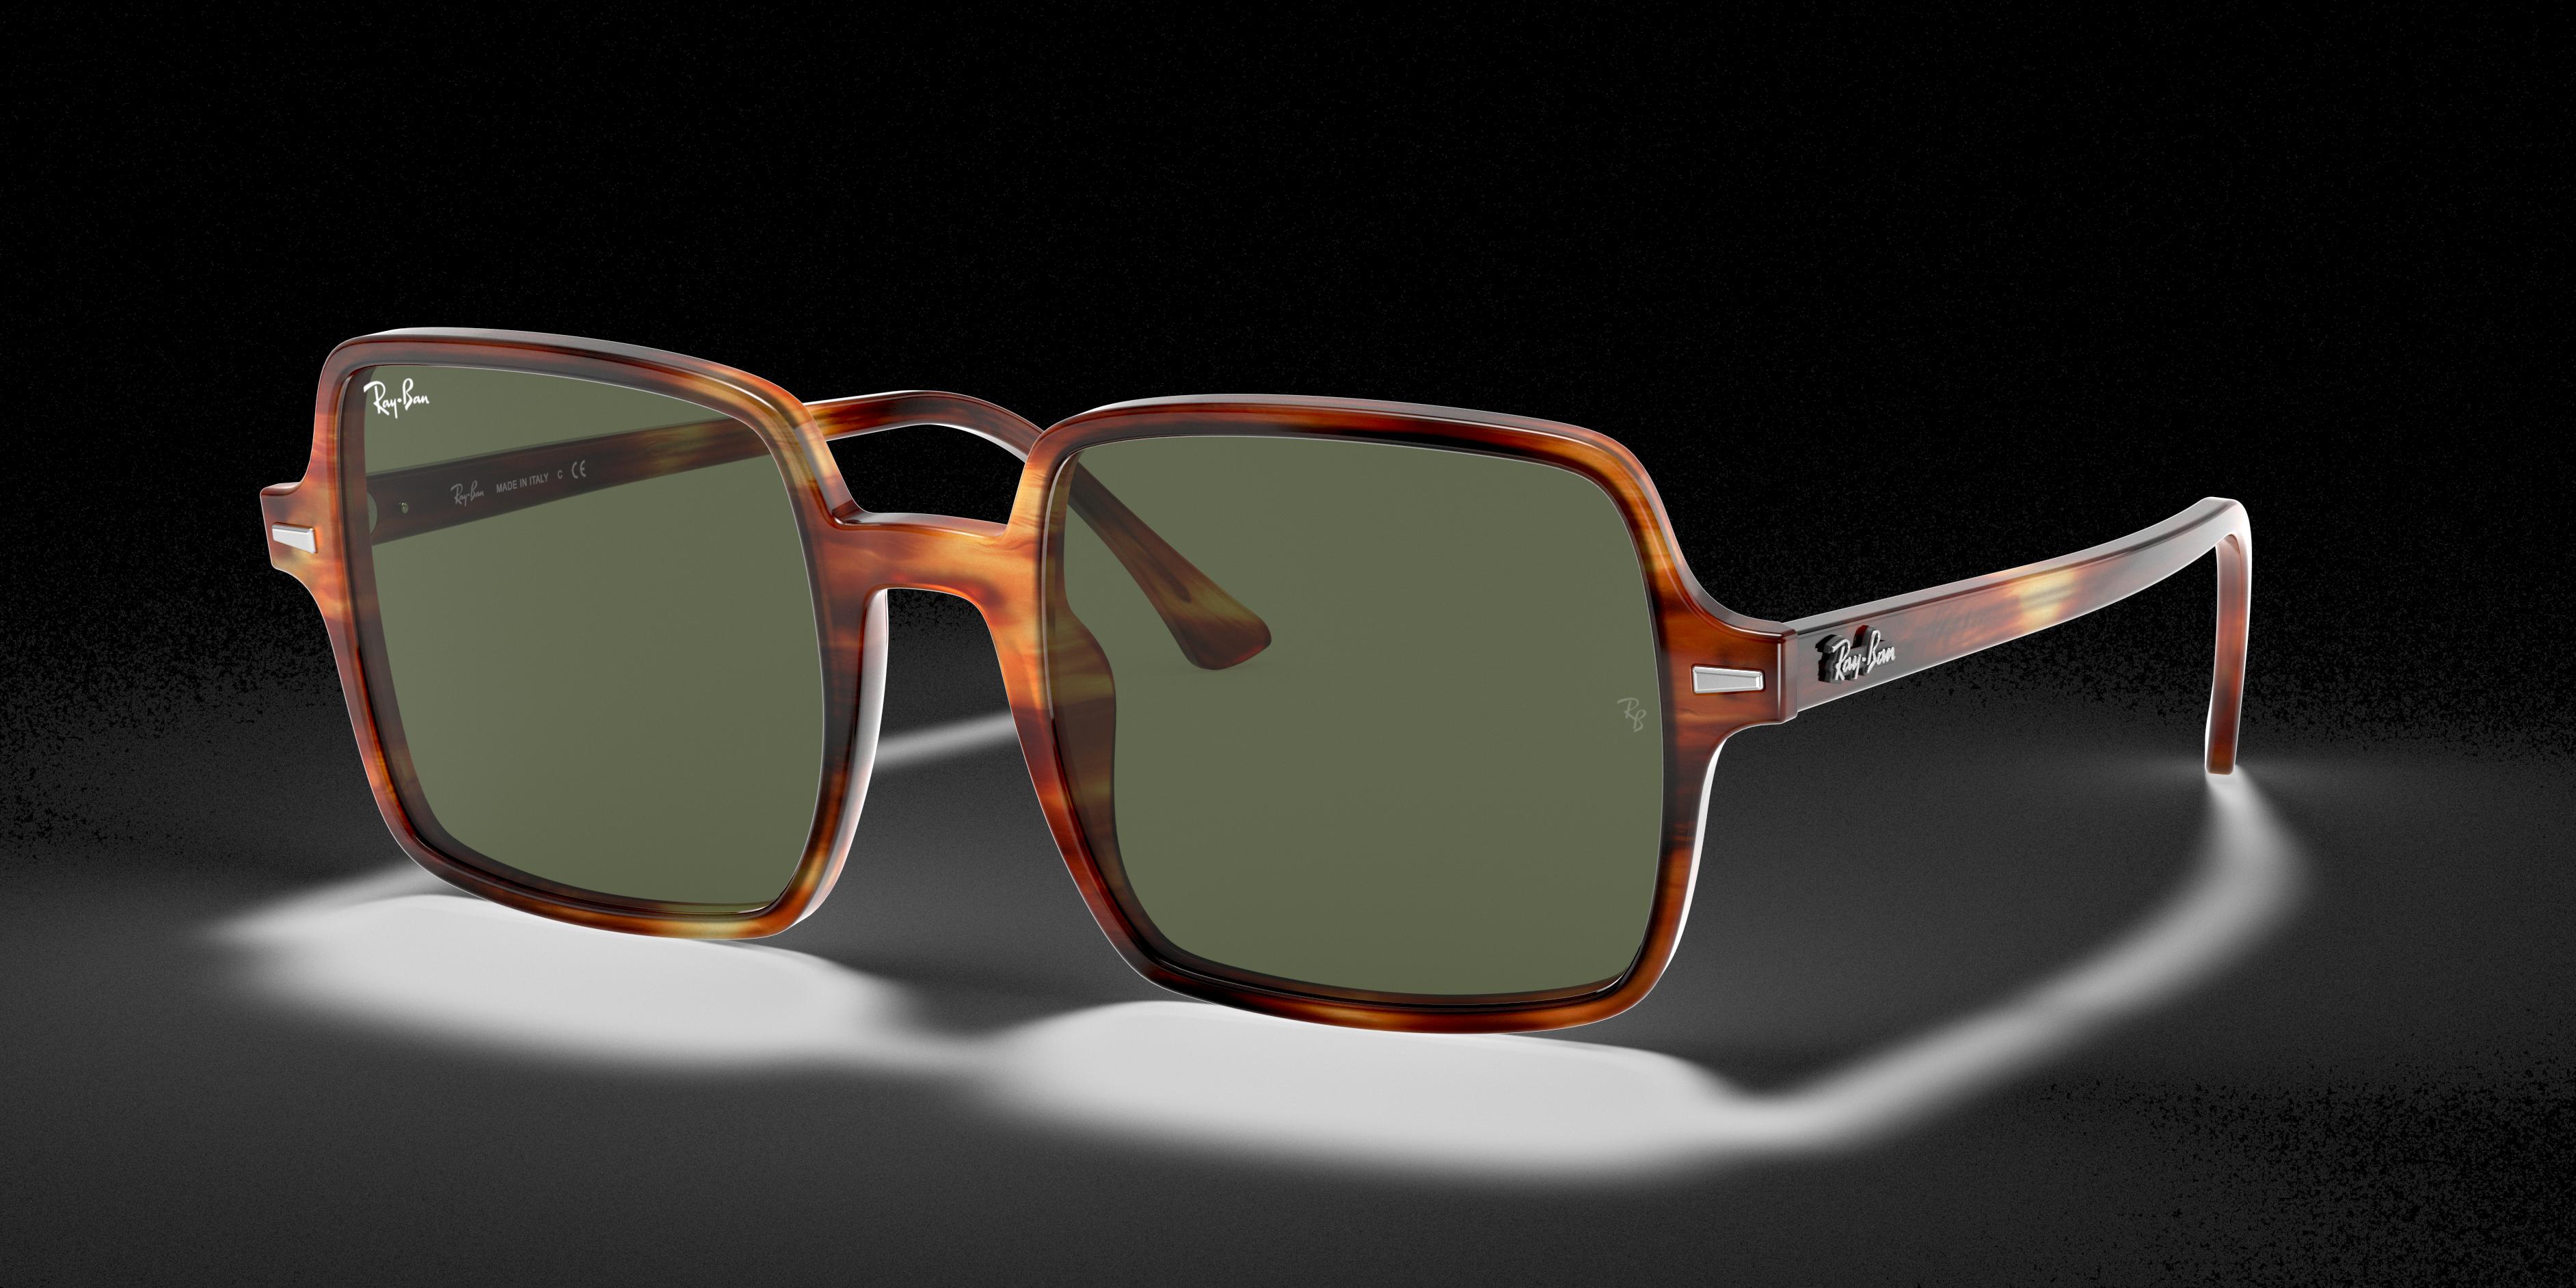 Ray-Ban Square II Tortoise, Green Lenses - RB1973